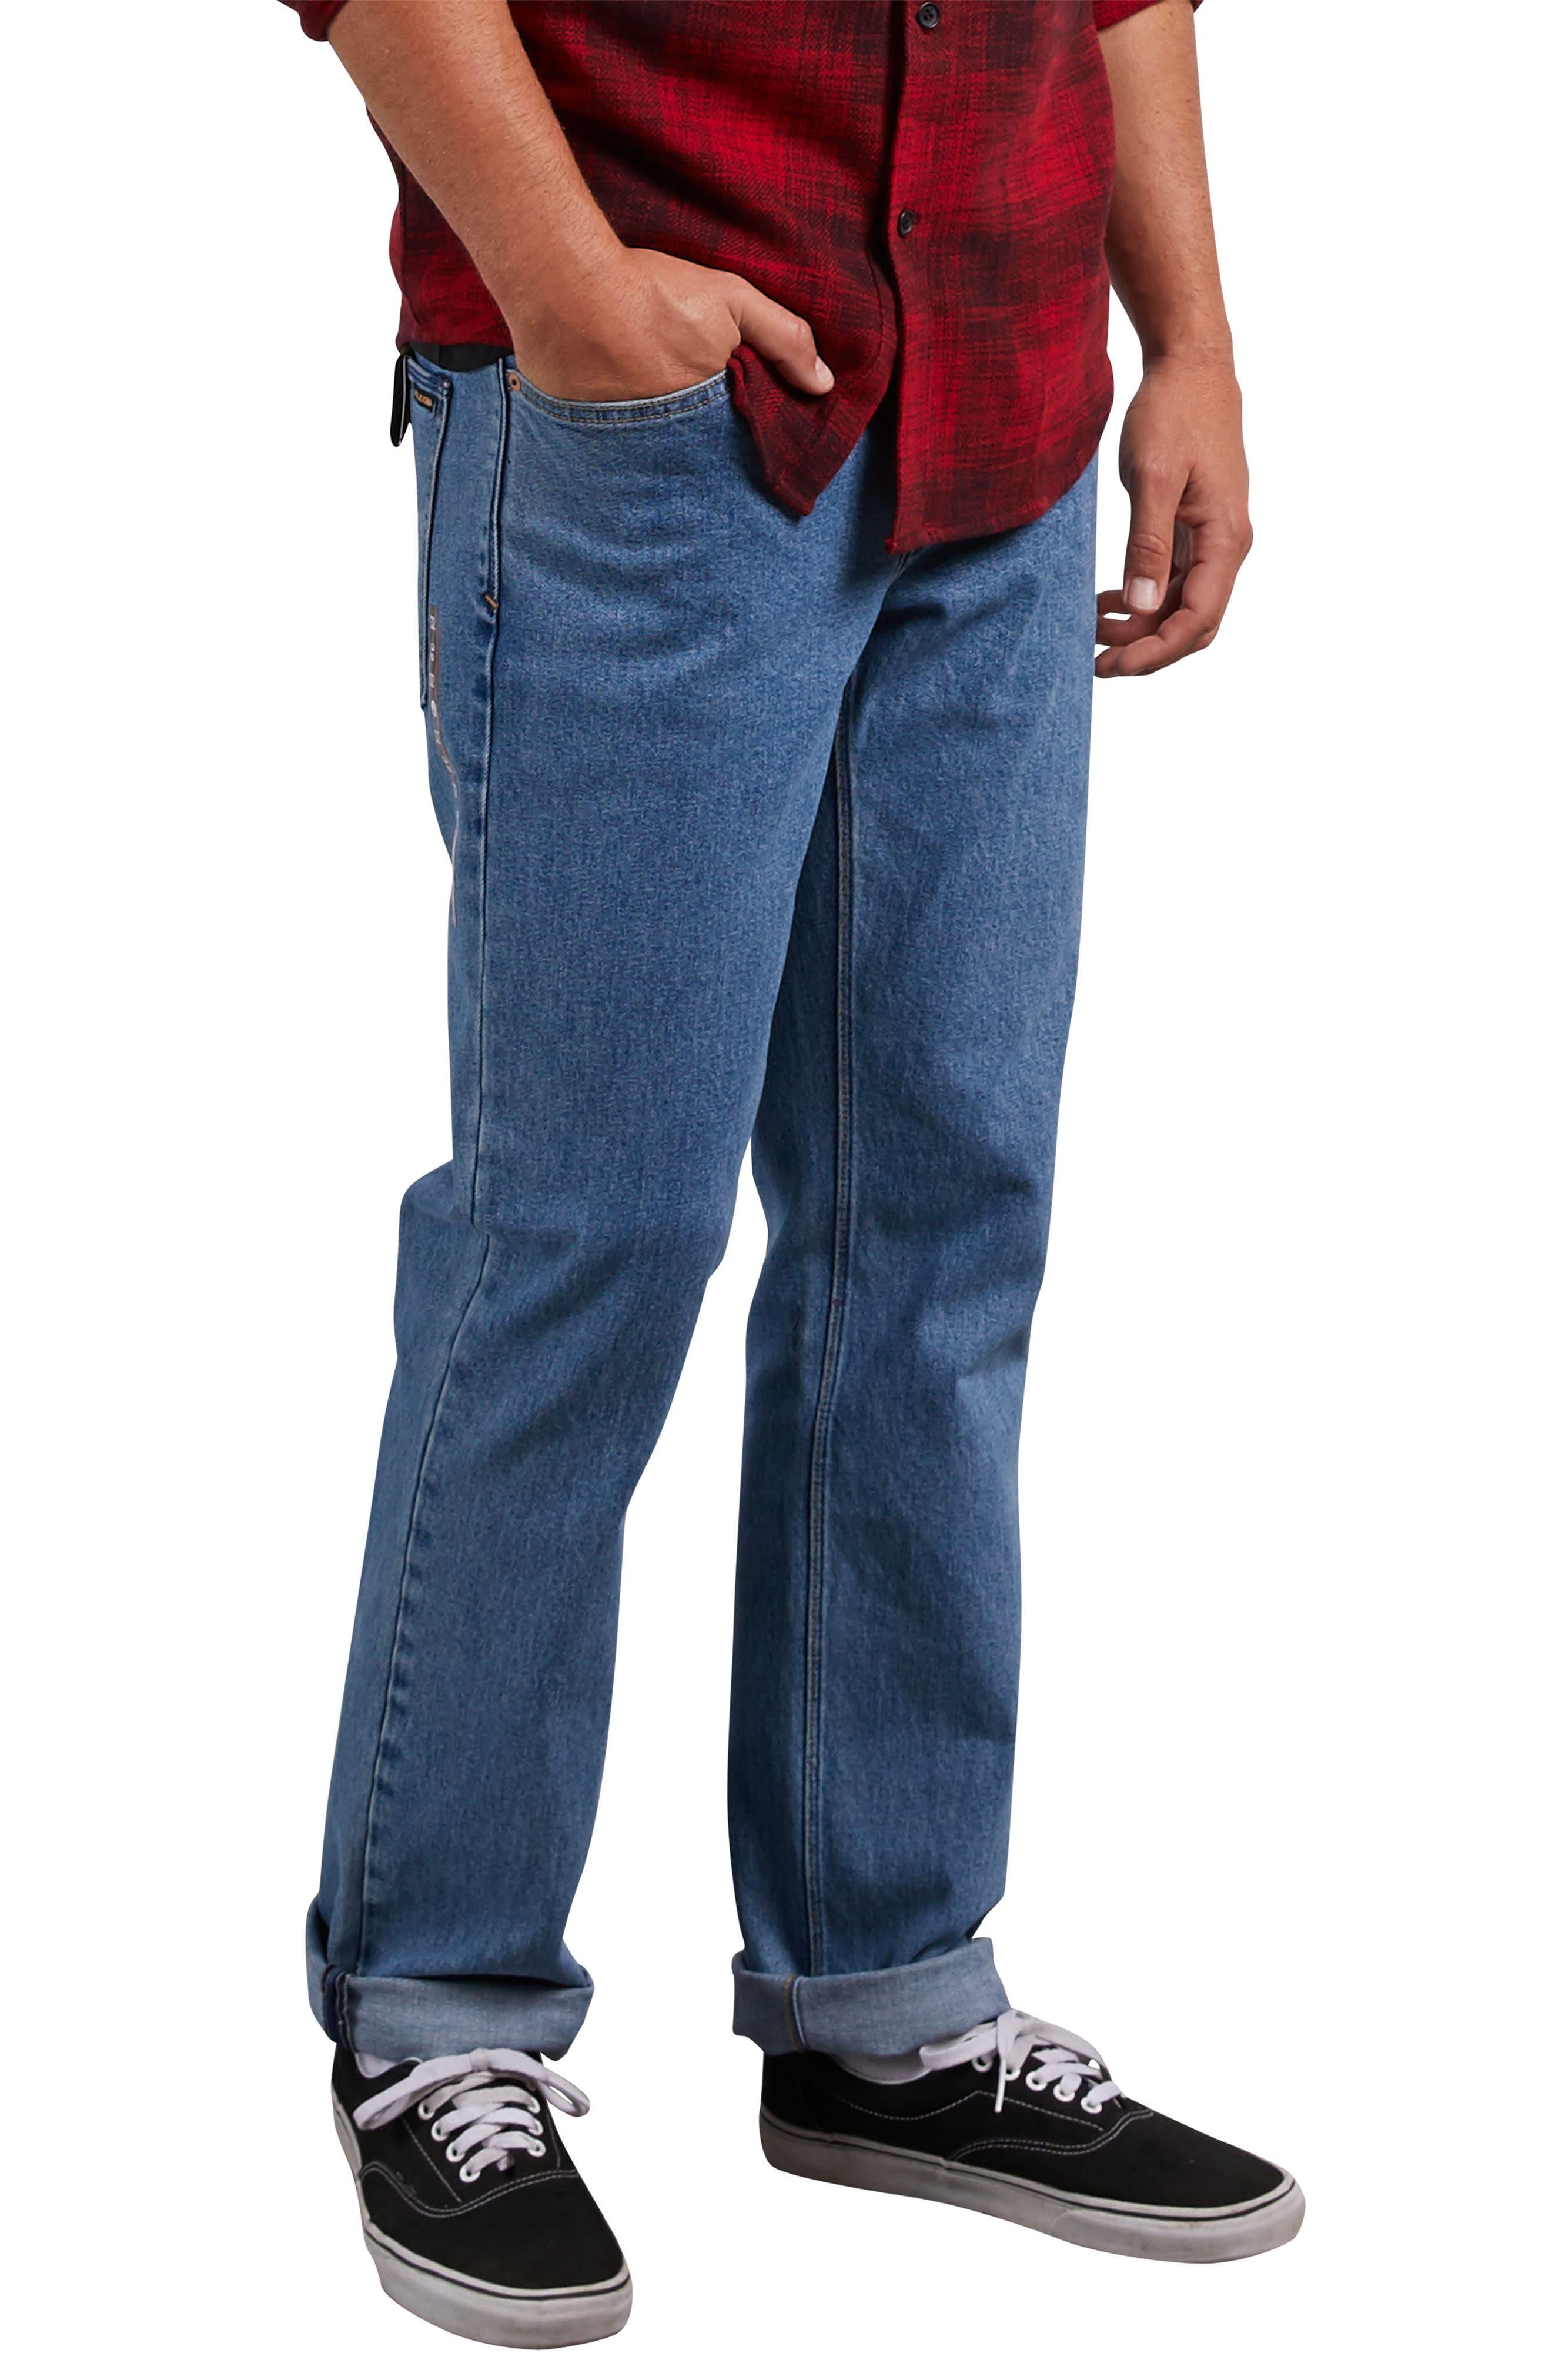 Solver Straight Leg Jeans,                             Alternate thumbnail 3, color,                             STONE BLUE